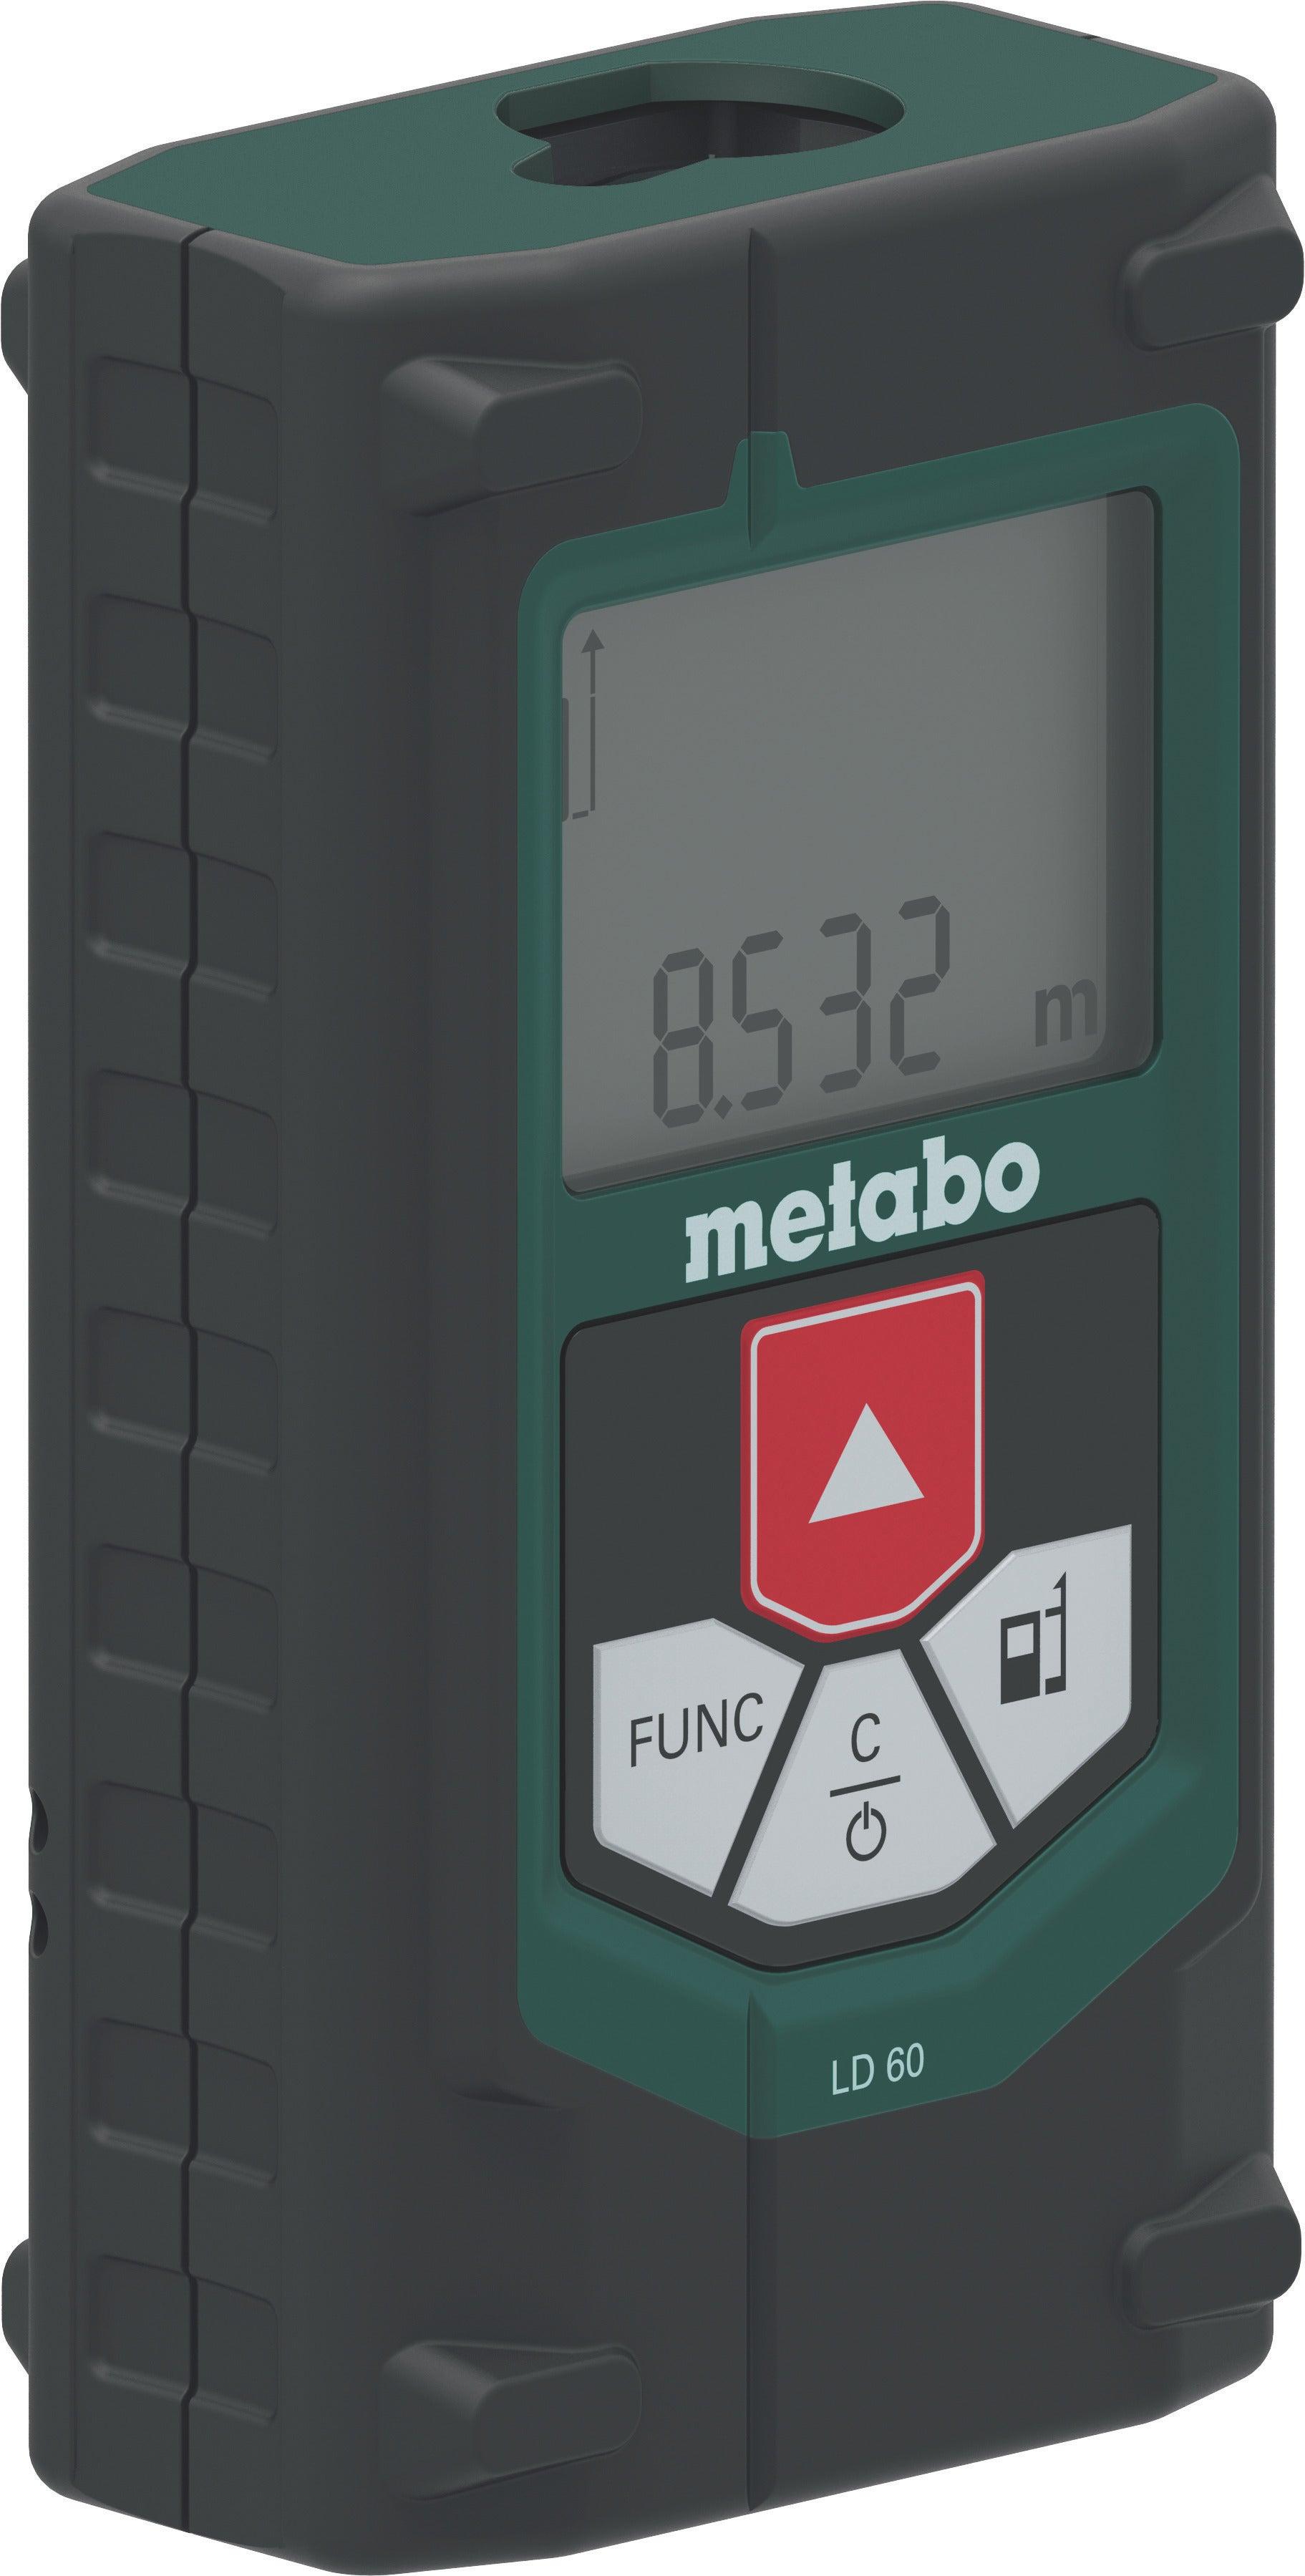 Télémètre Laser Metabo Ld 60 60 M